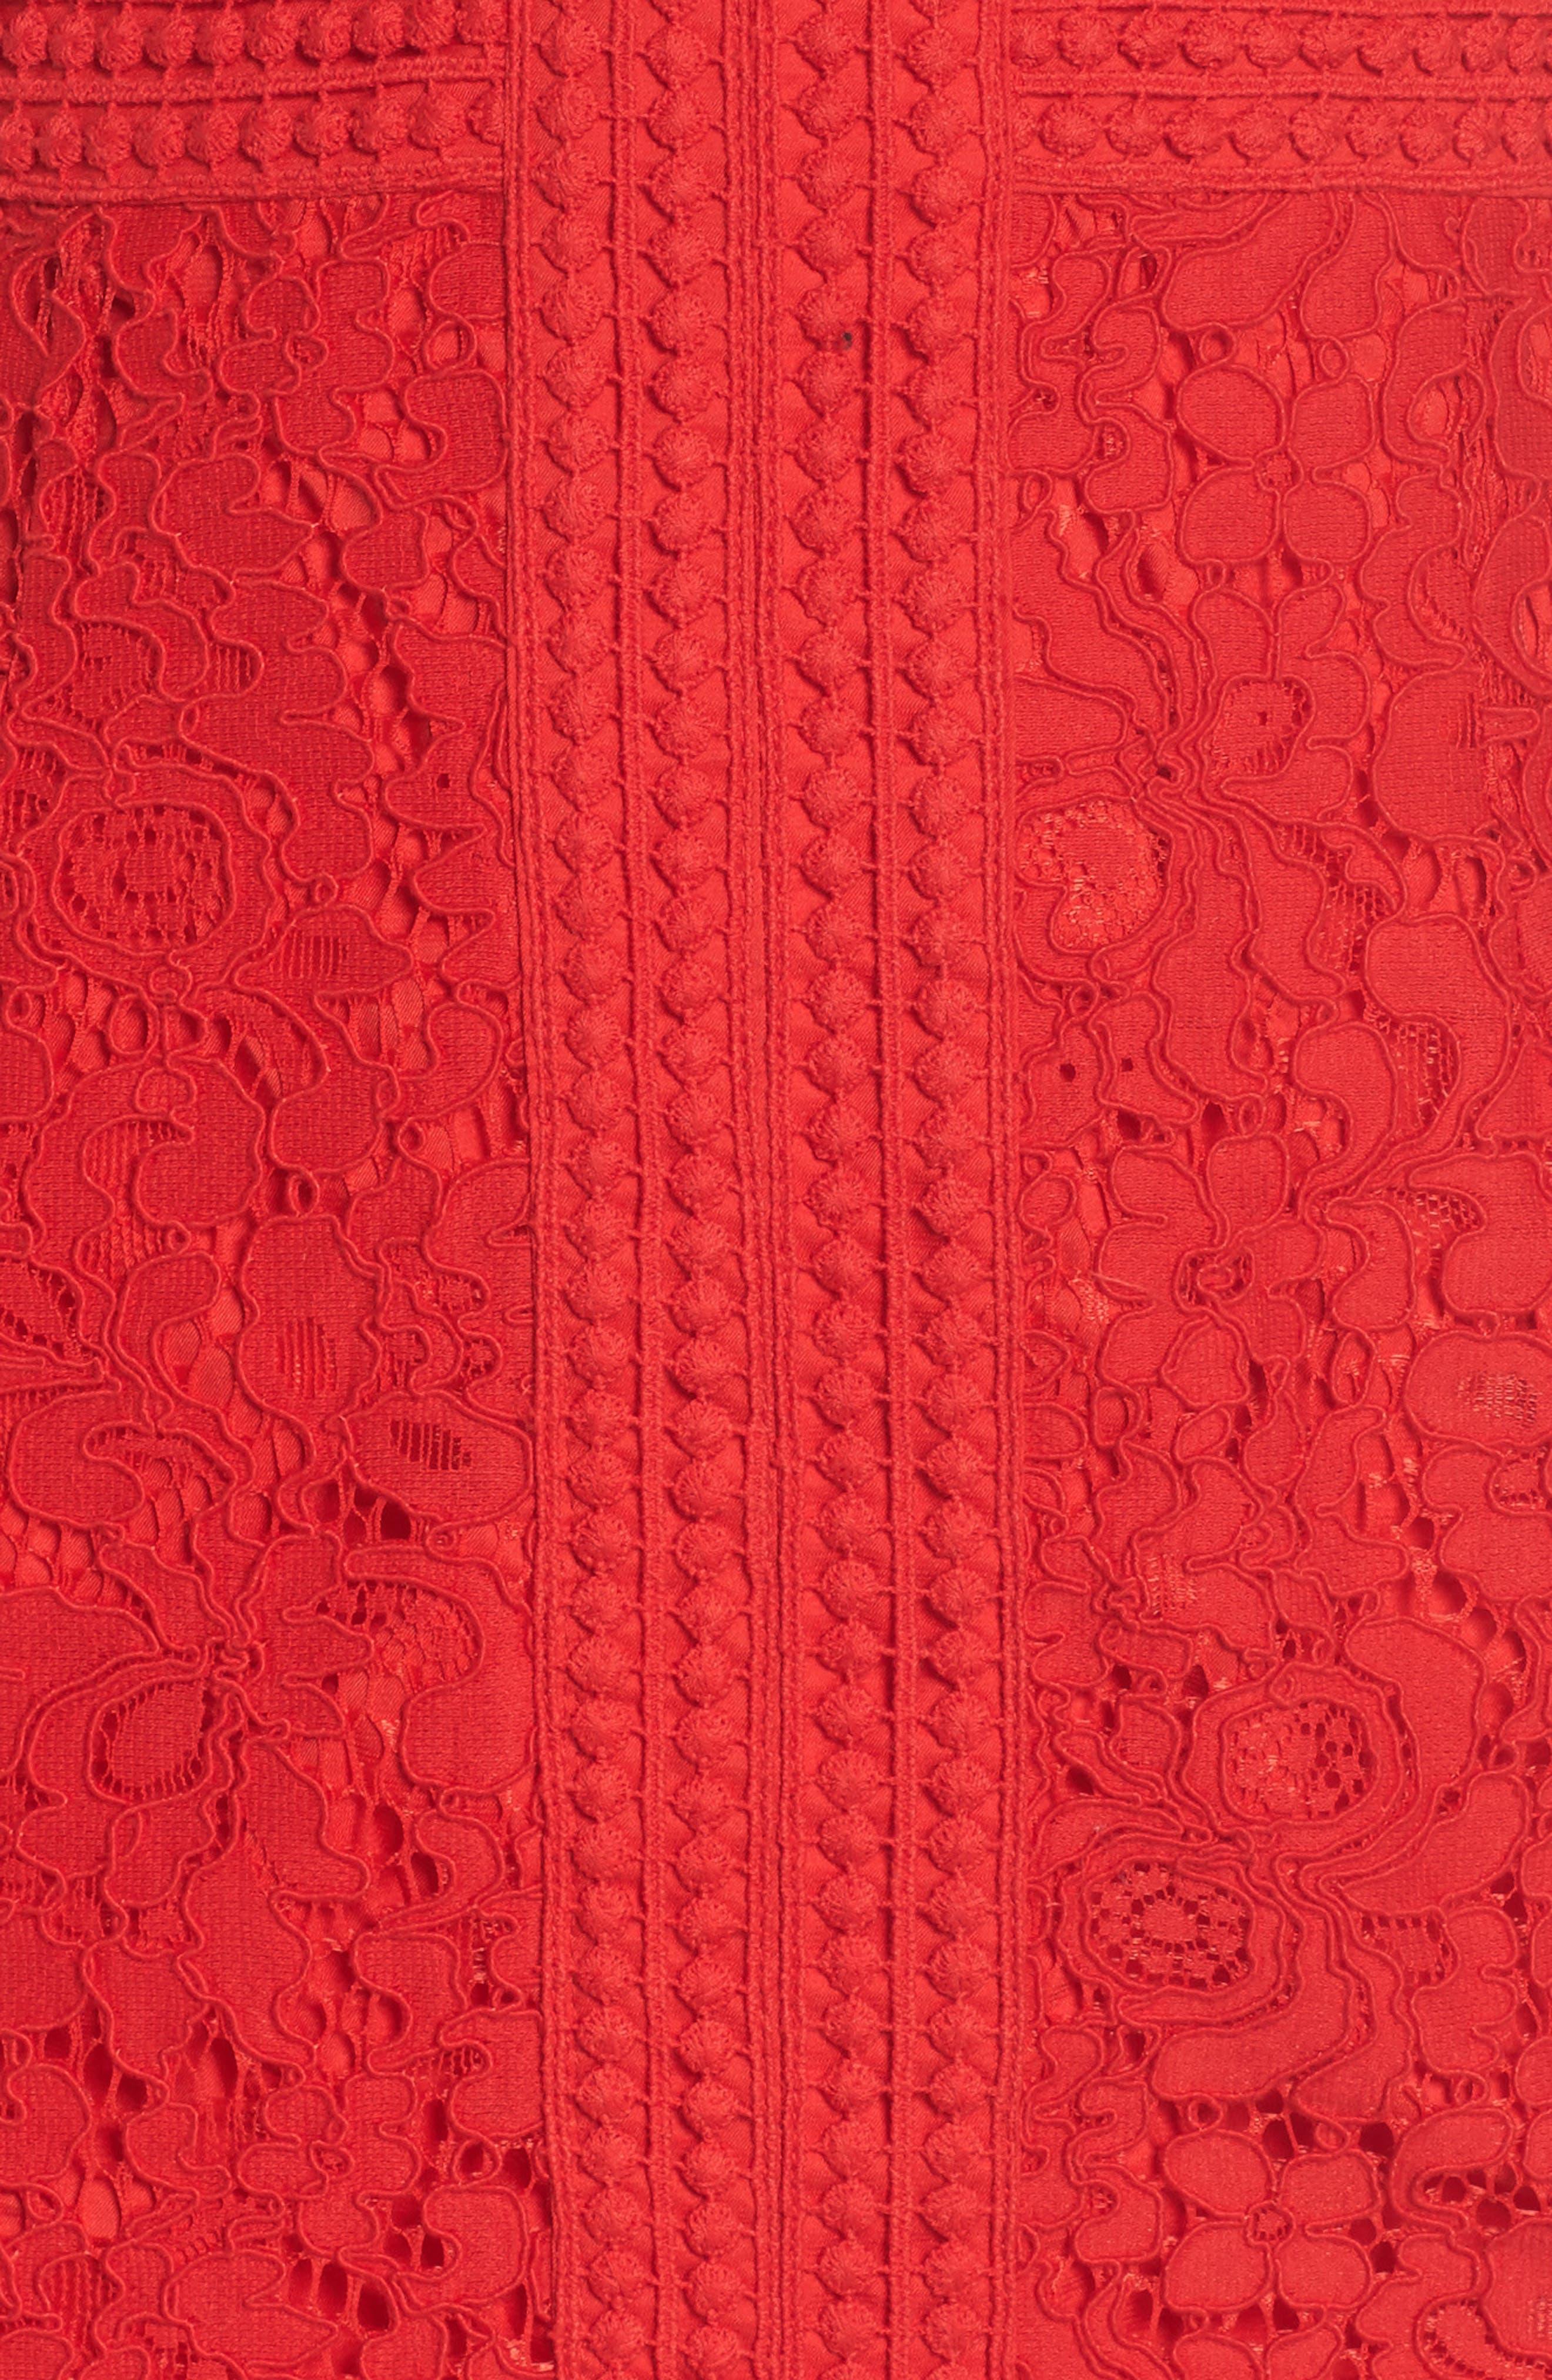 Morgan Front Slit Lace Sheath Dress,                             Alternate thumbnail 6, color,                             LIPSTICK